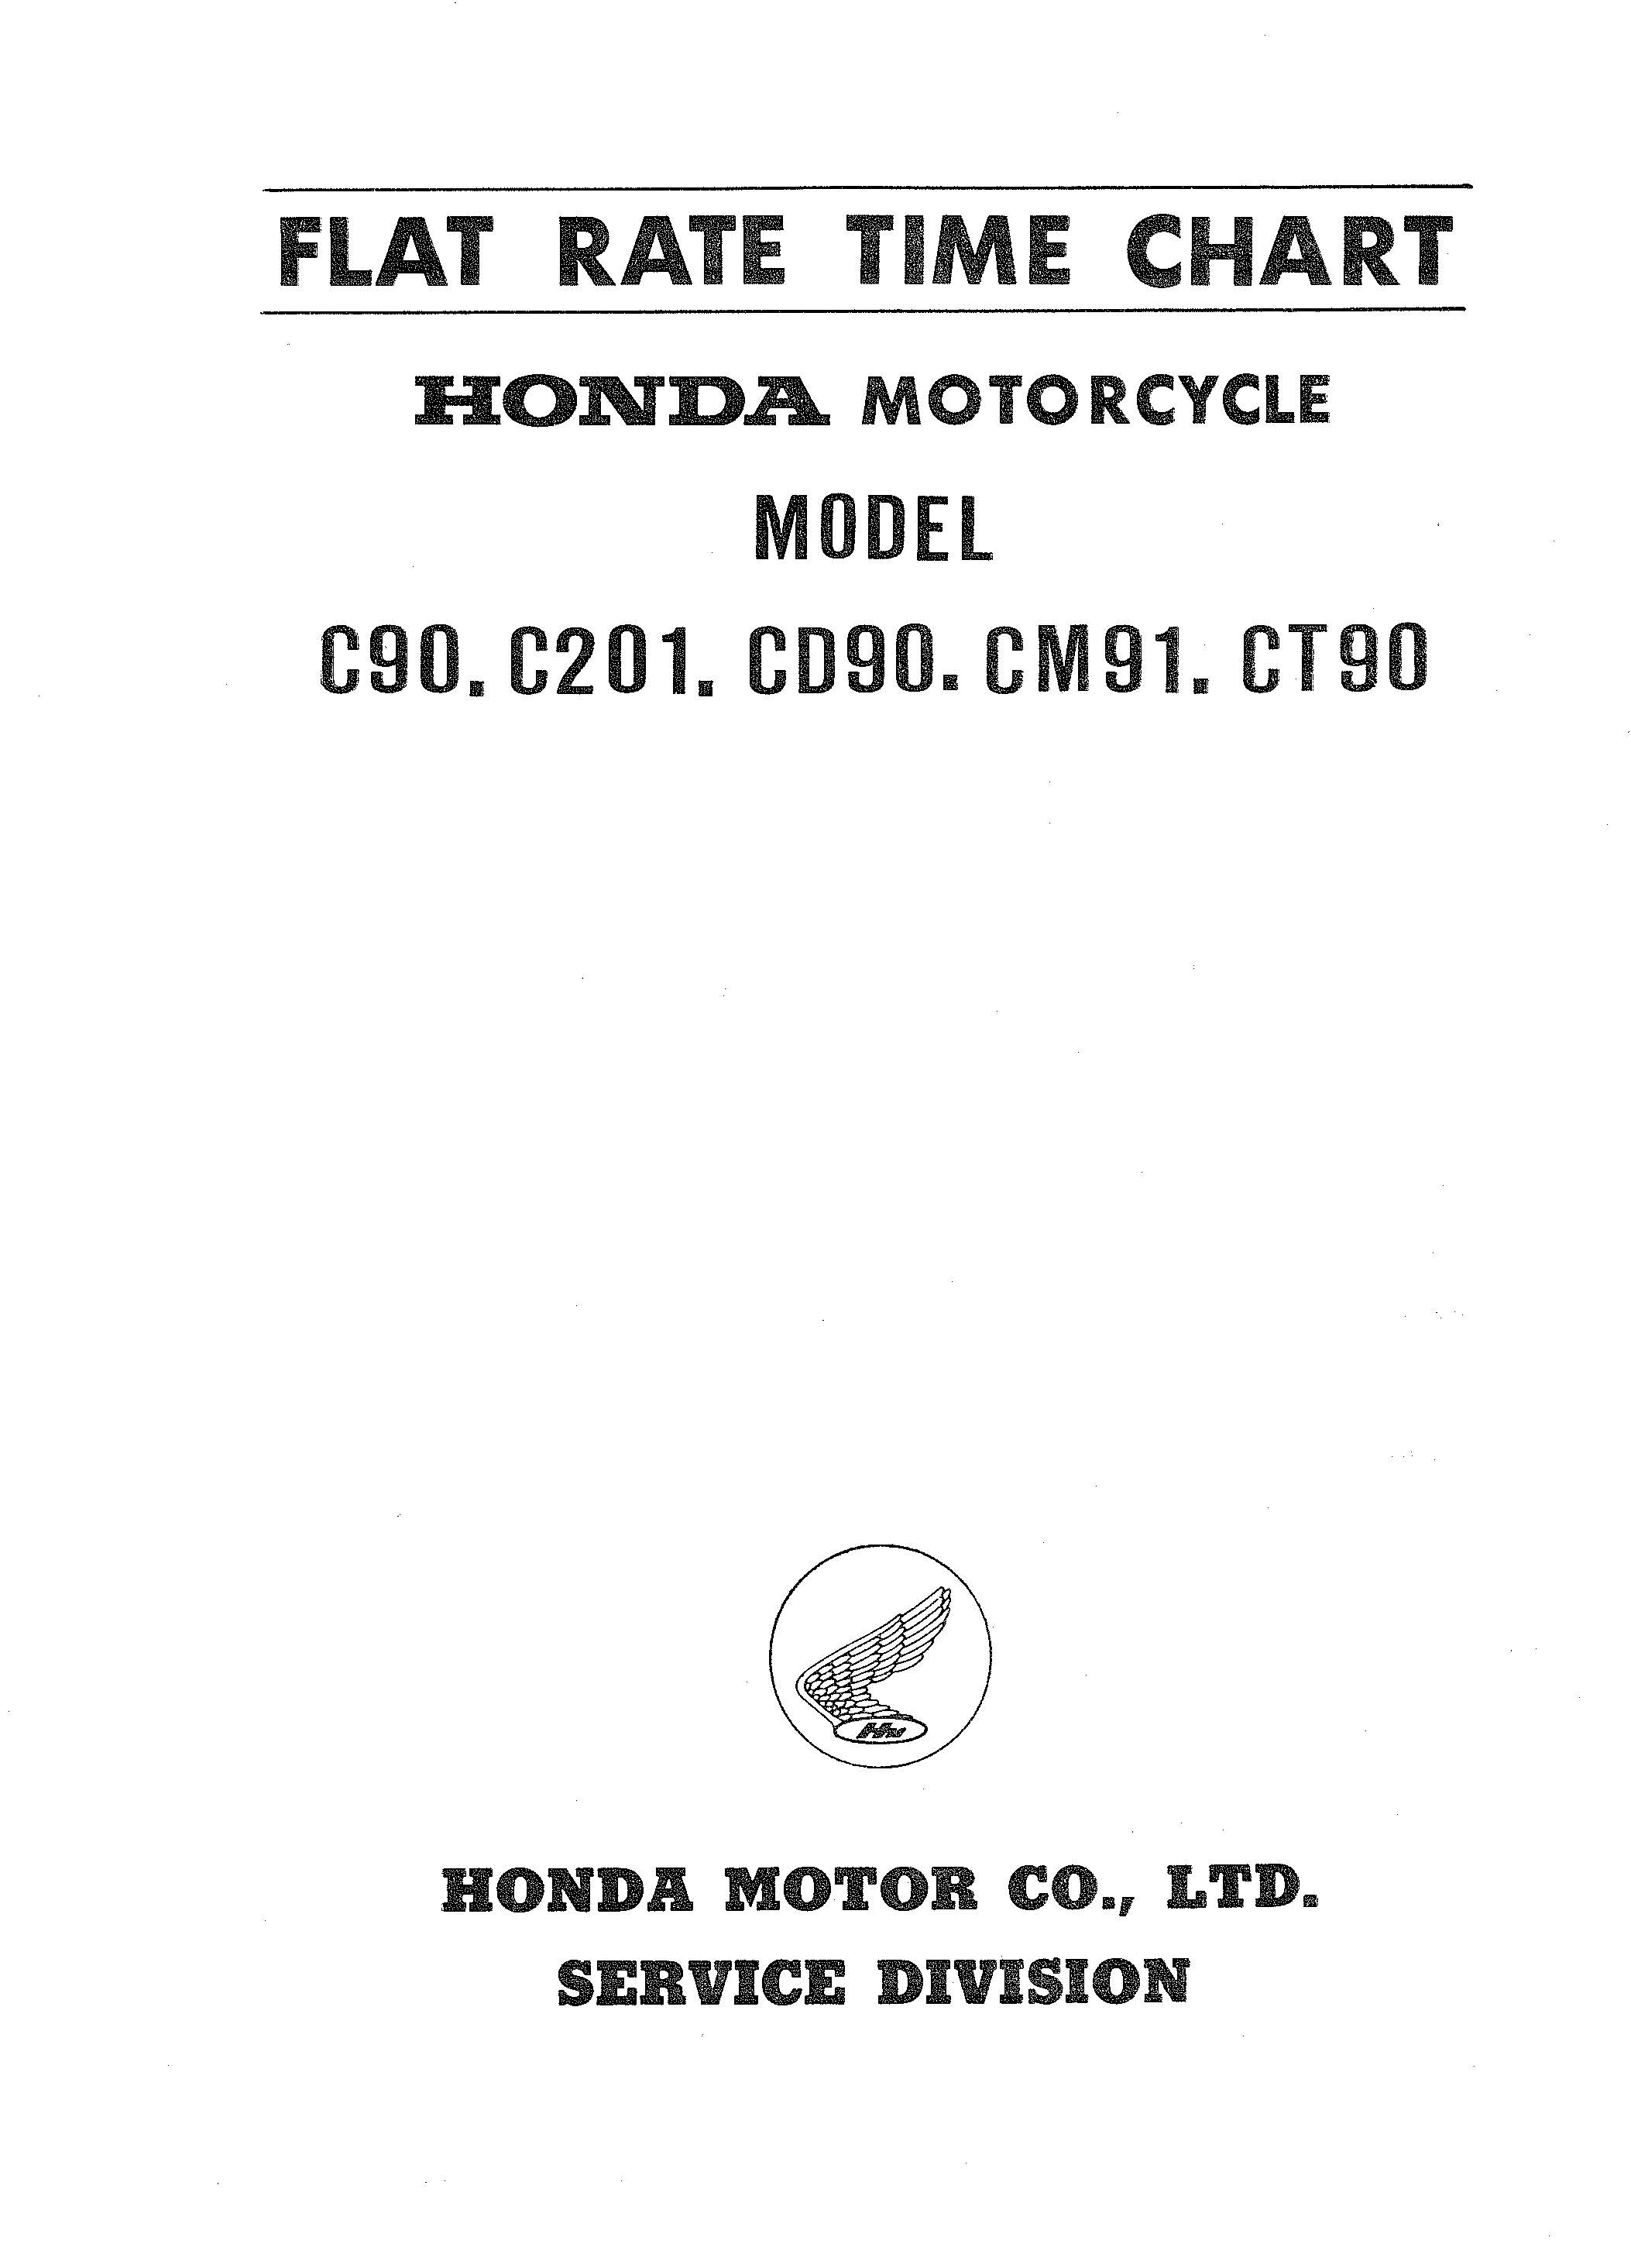 Parts list for Honda C201 (1967)